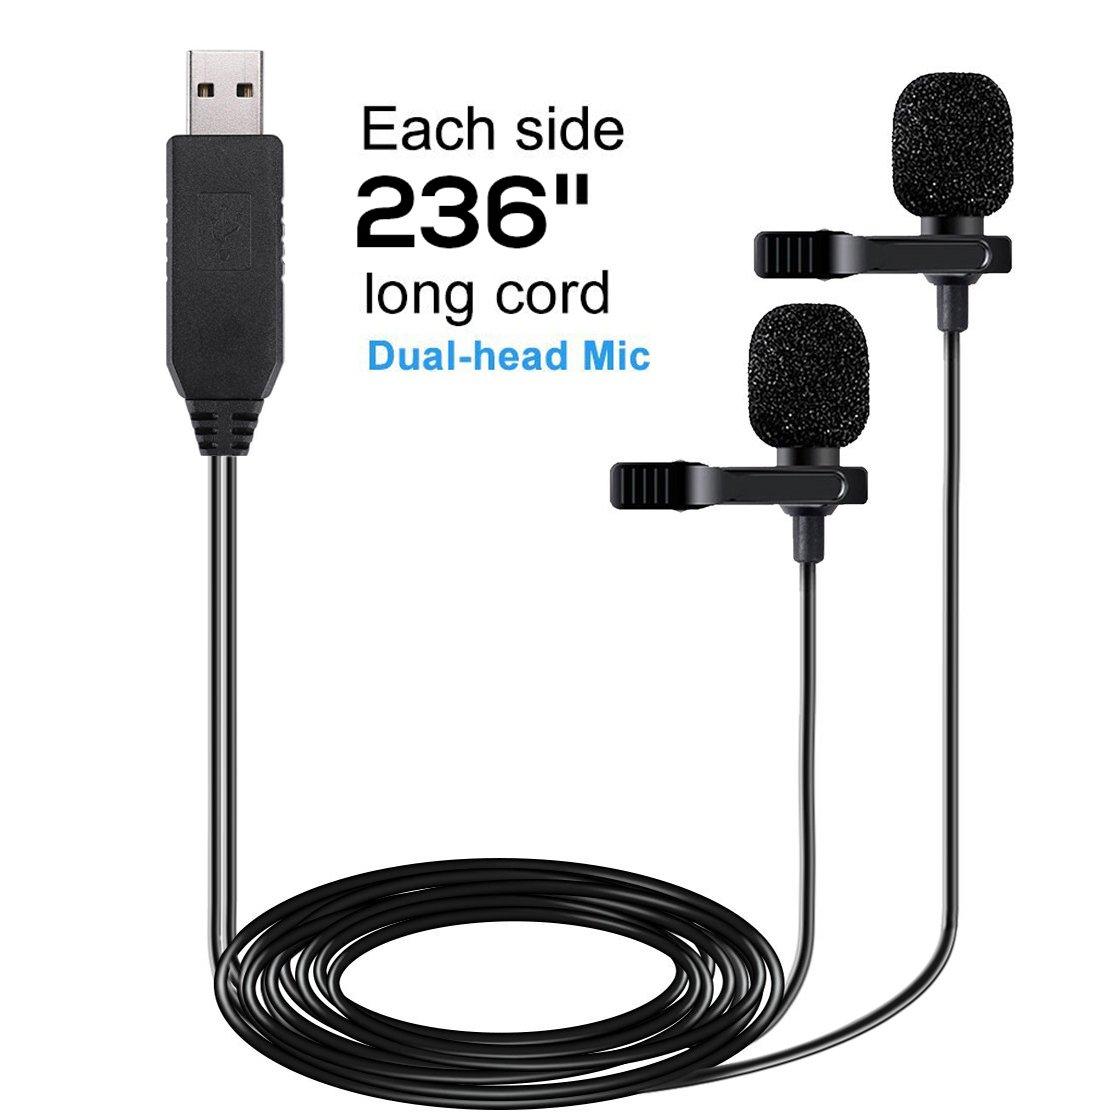 Micrófono USB 236 (6 m) Micrófono Lavalier de cabeza doble Micrófono Lavalier profesional Camisa con clip profesional Mi